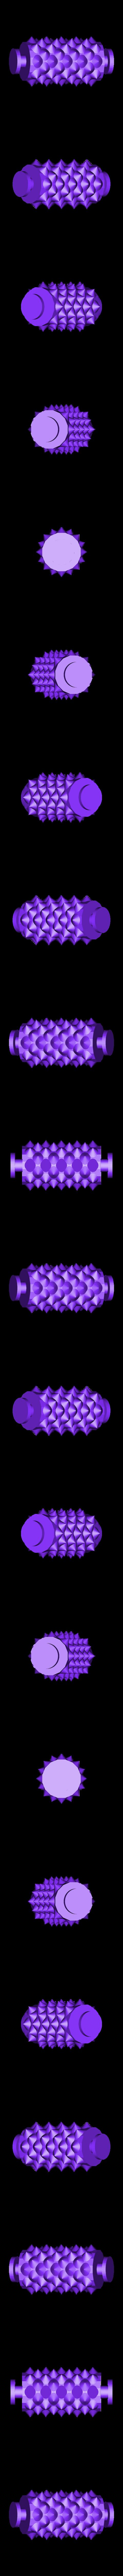 mas_c.stl Download free STL file Massage tool (+v2) • 3D printing design, kpawel